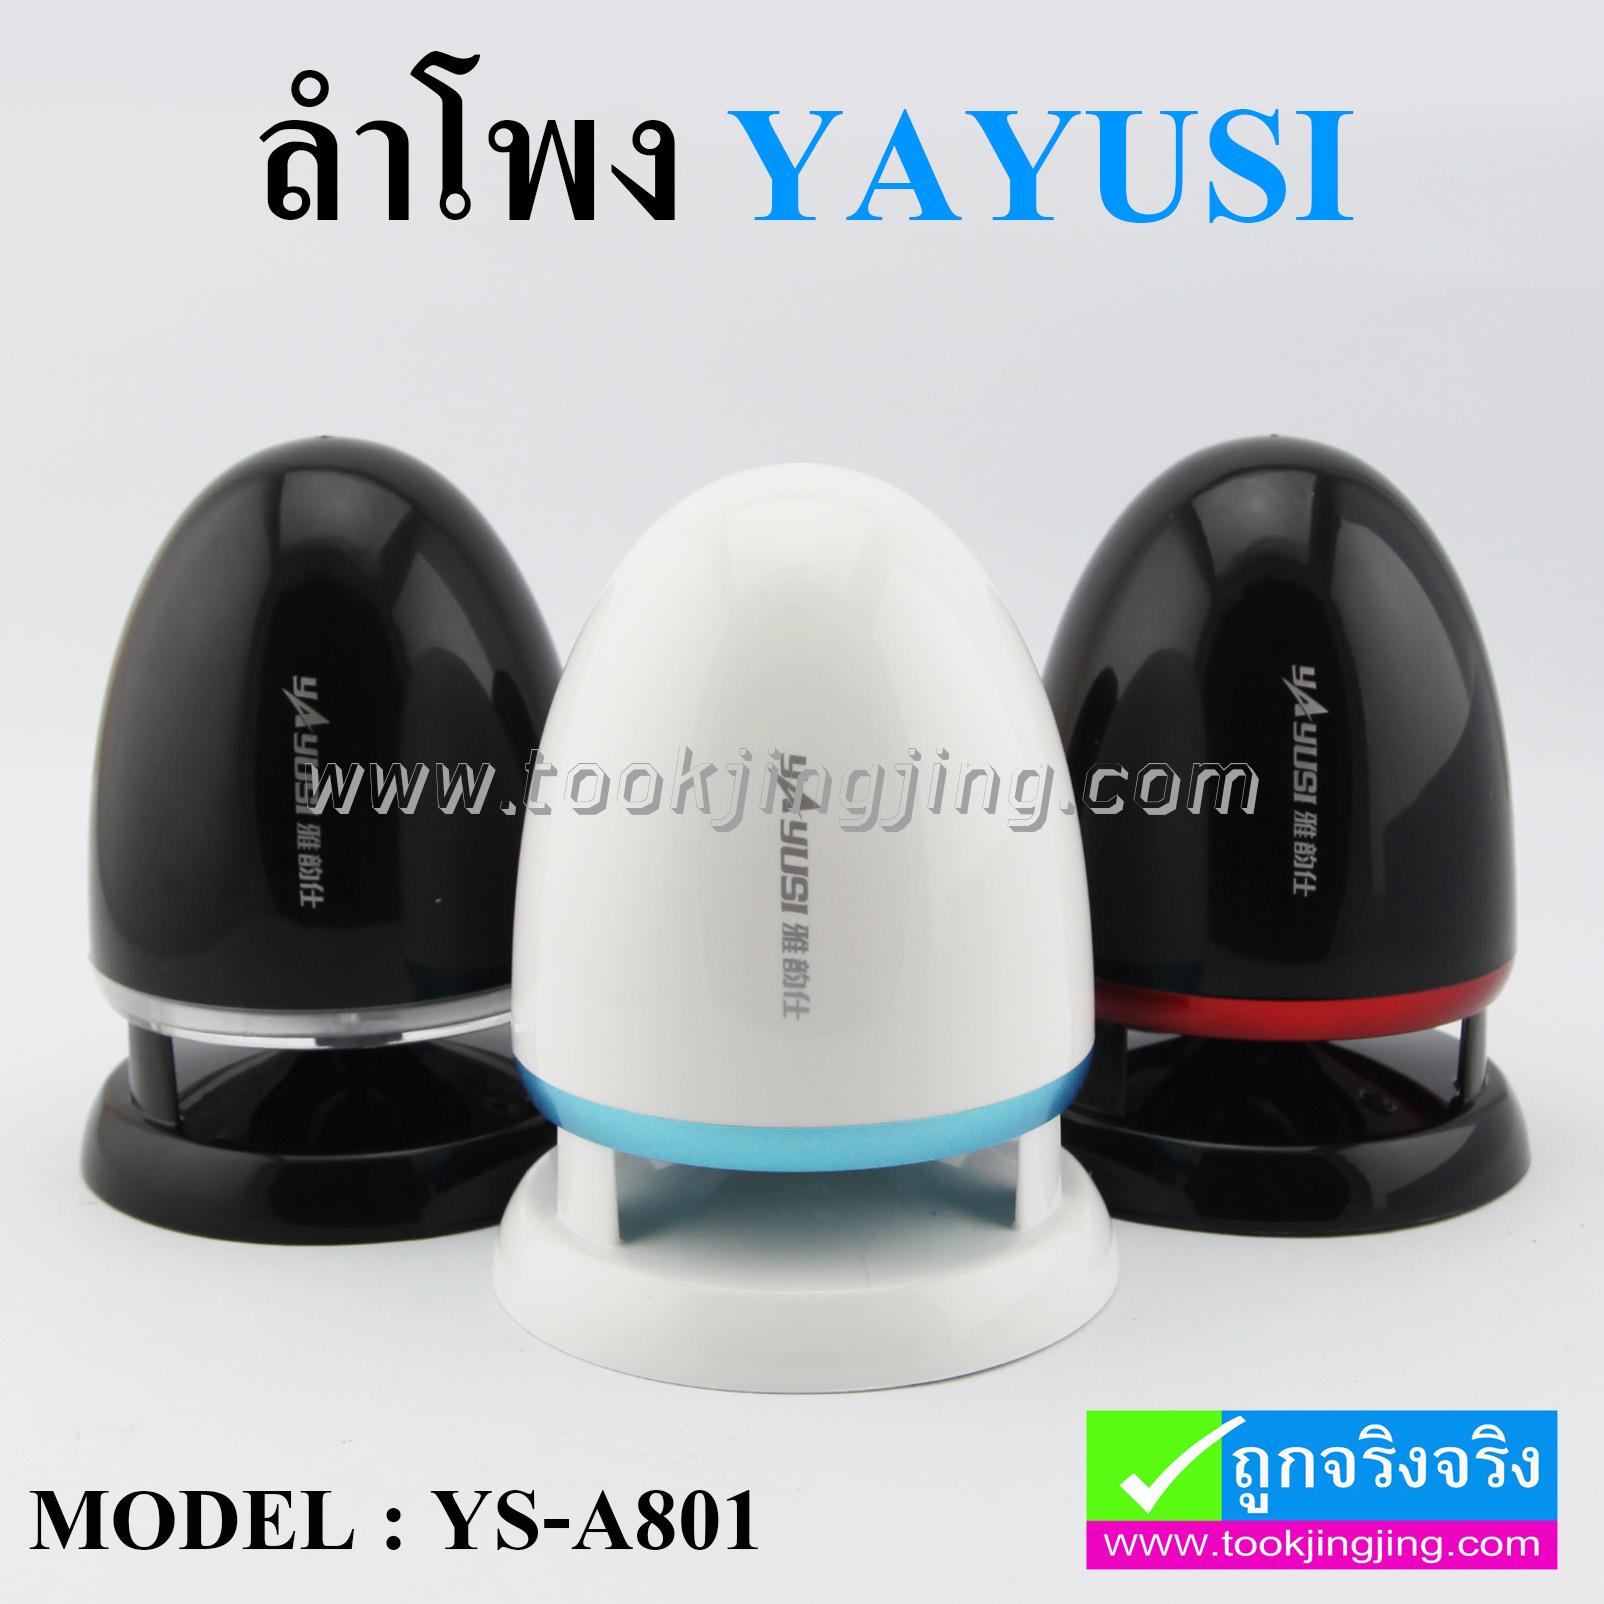 YAYUSI YS-A801 ลำโพง ขนาดพกพา